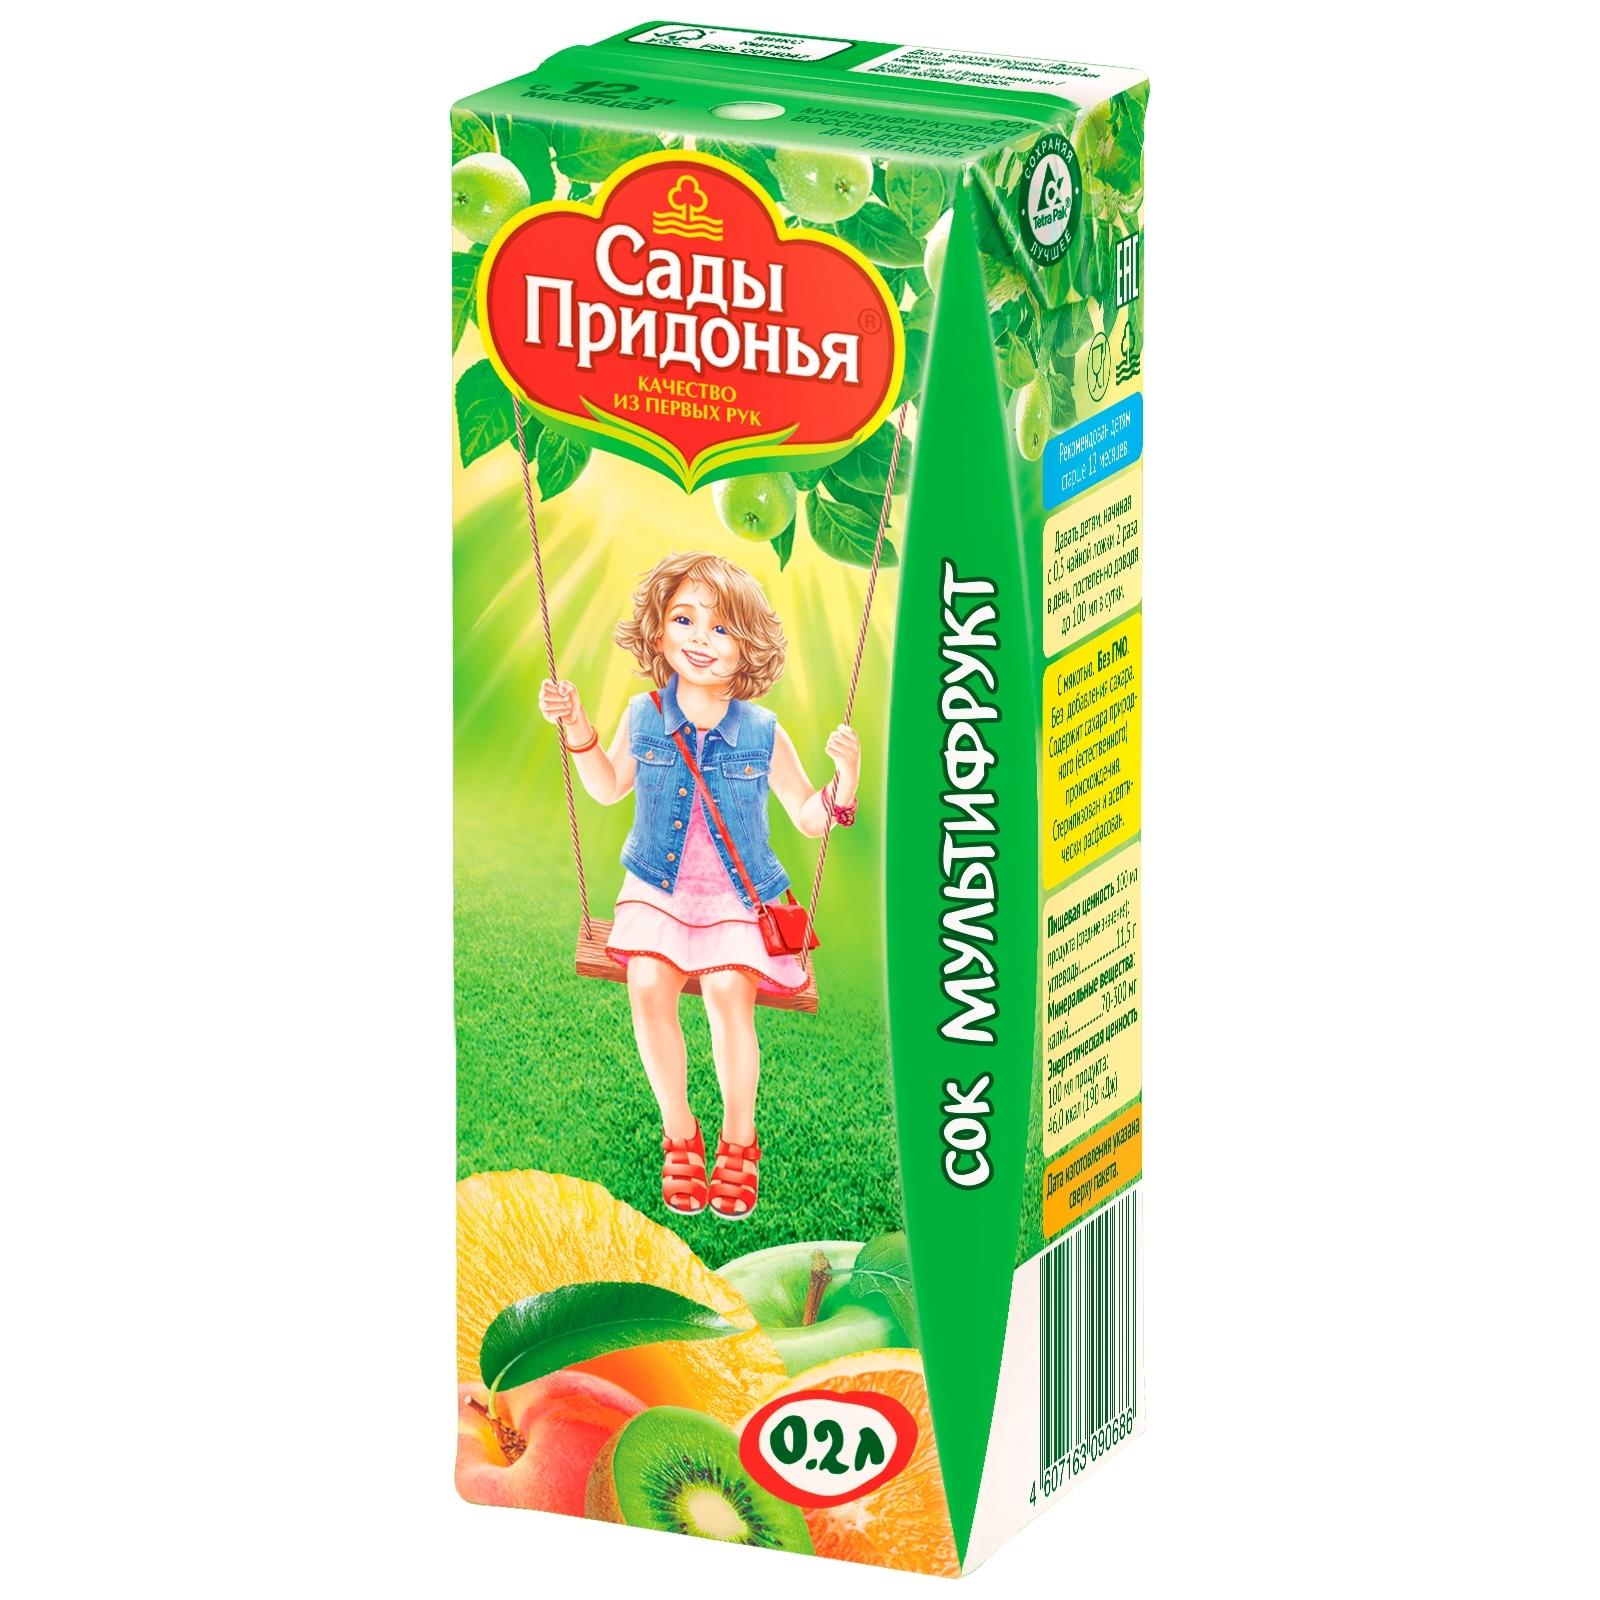 Сок Сады Придонья 200 мл (тетрапак) Мультифруктовый (с 12 мес)<br>